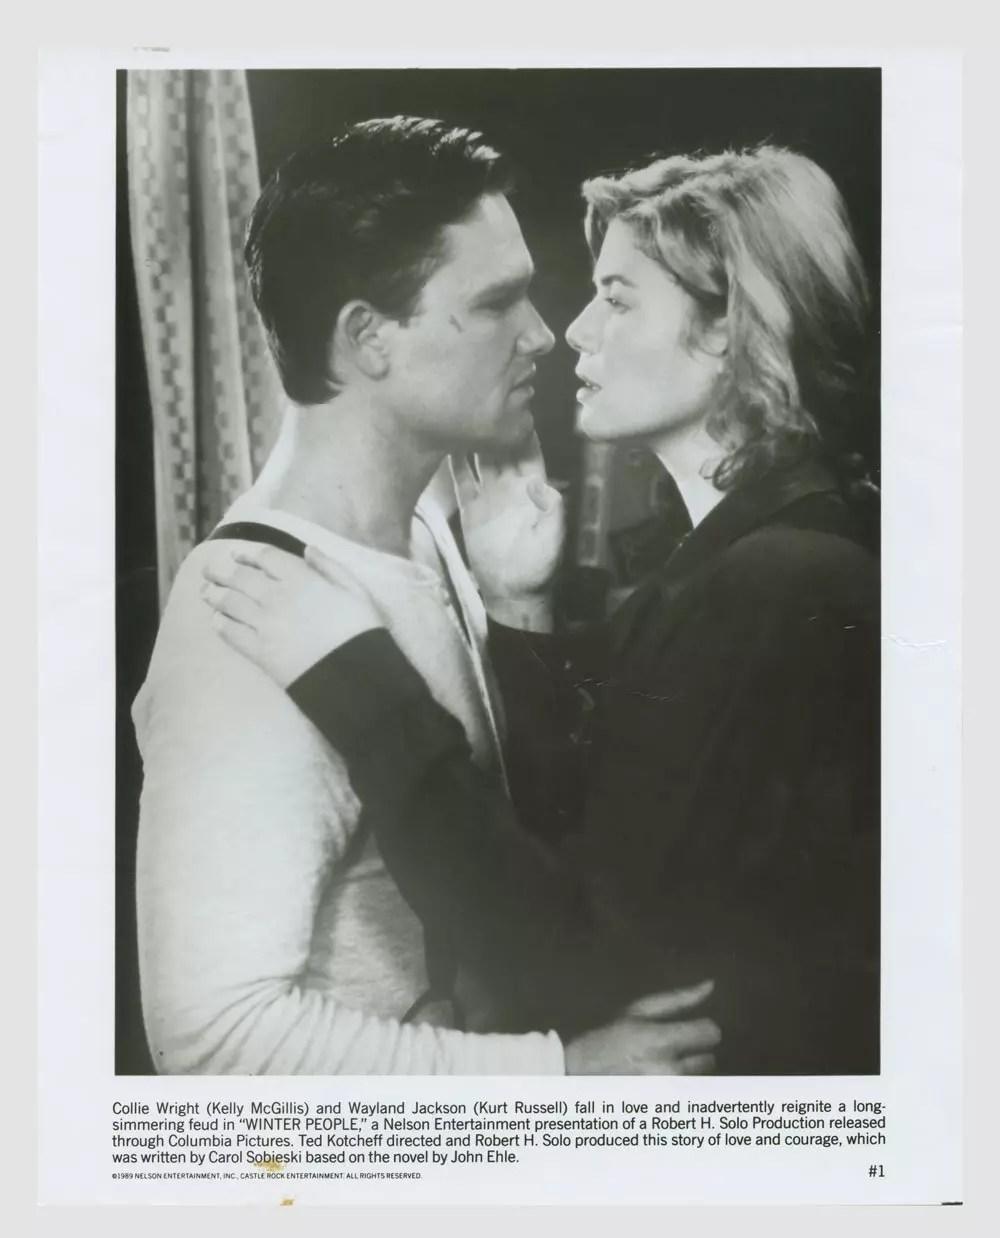 Kelly McGillis Kurt Russell 1989 Winter People Lobby Card 8x10